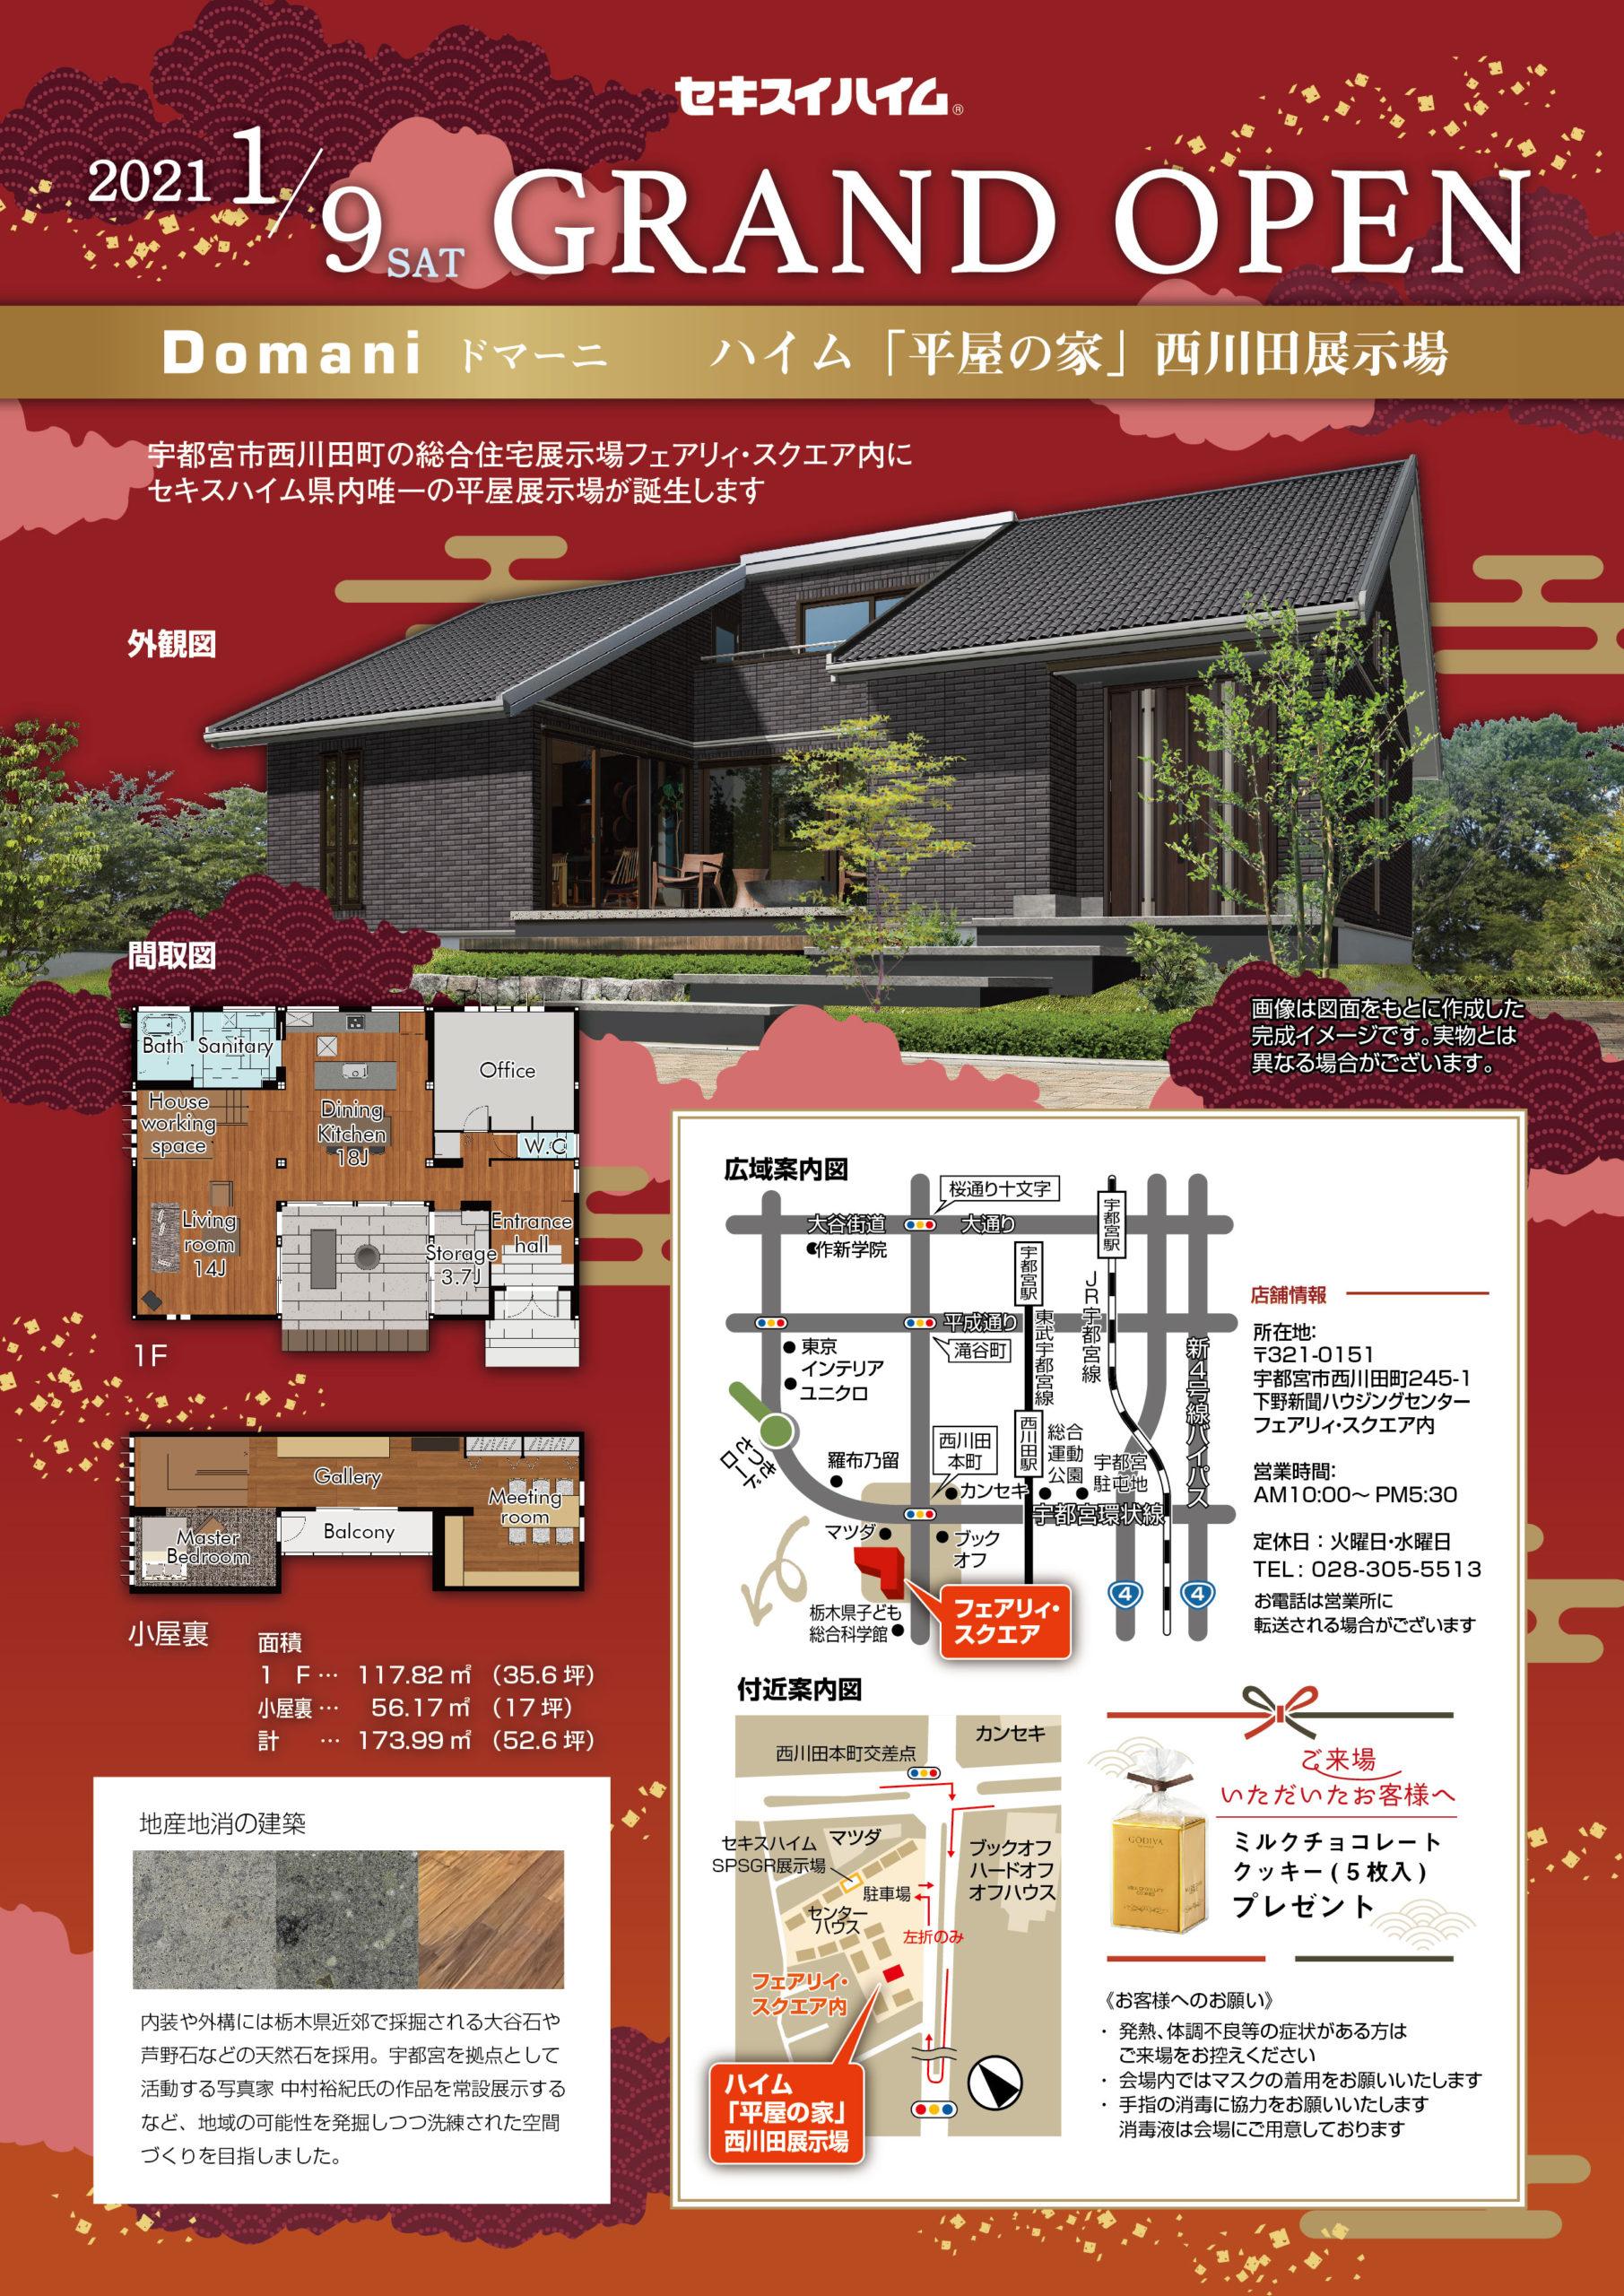 GRAND OPEN [ハイム「平屋の家」西川田展示場]のお知らせ